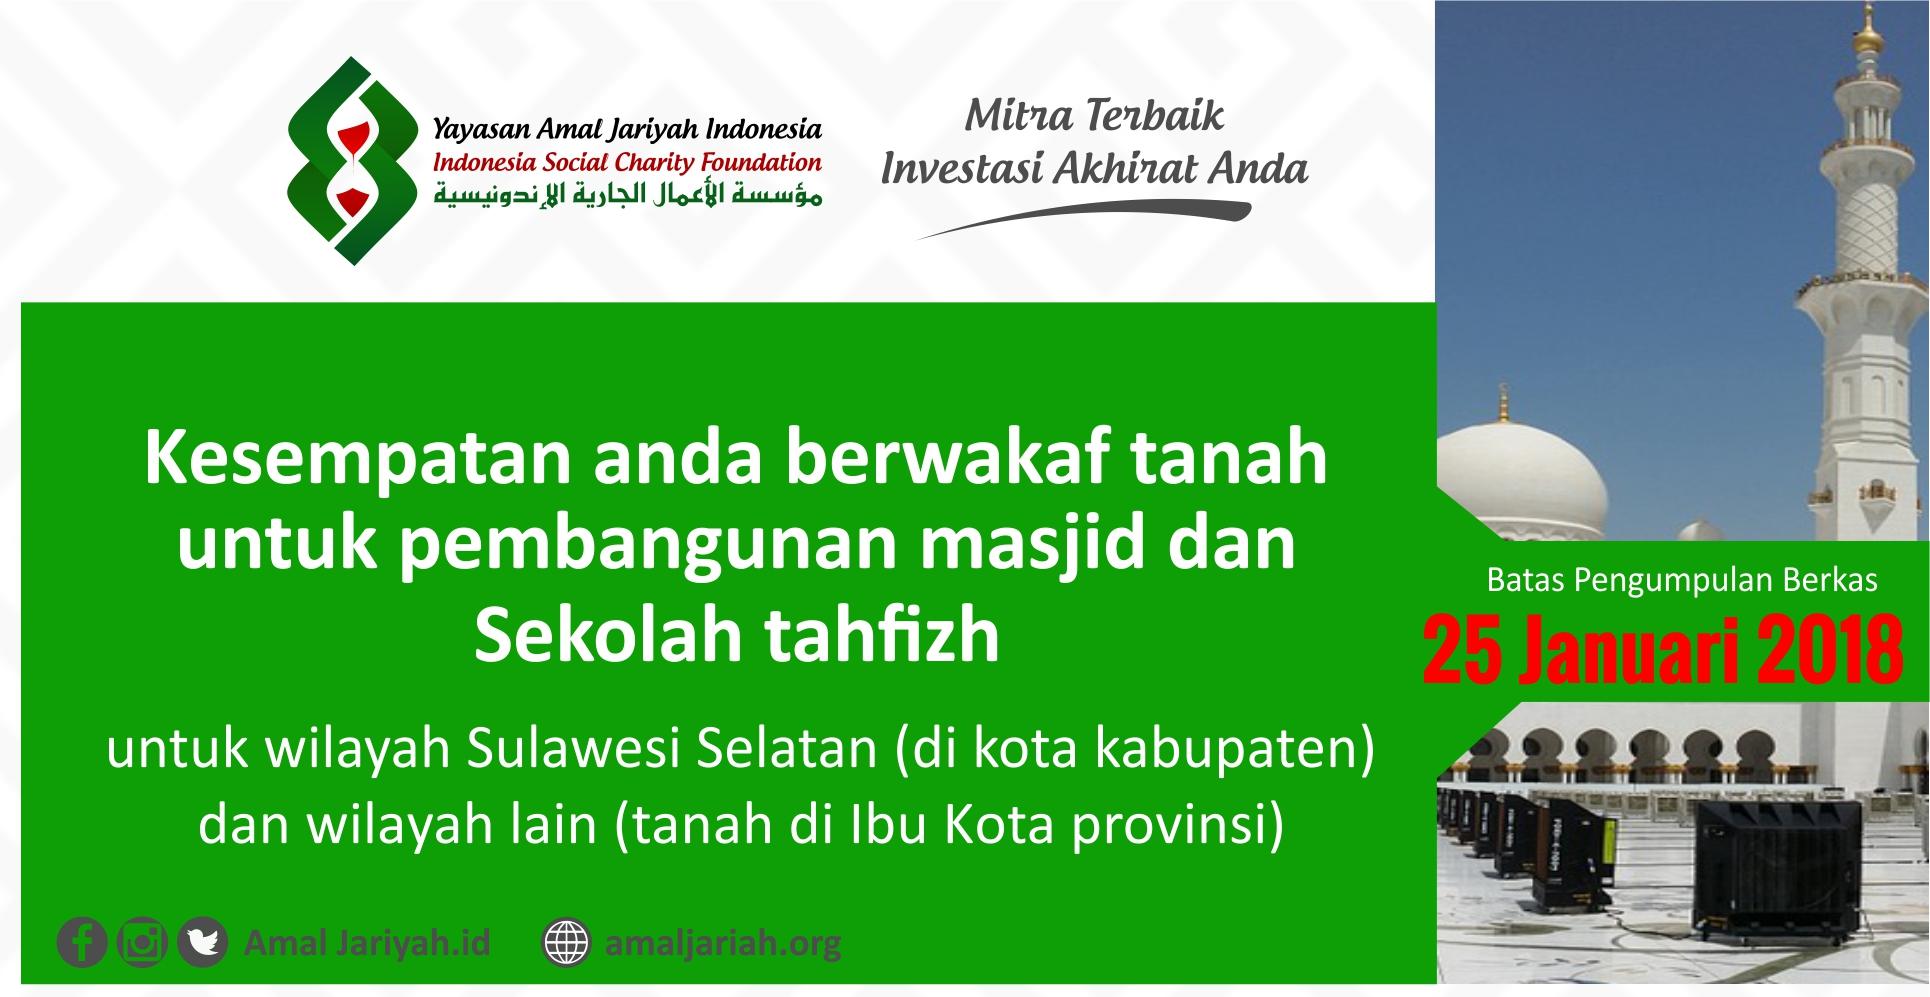 Bantuan Pembangunan Masjid